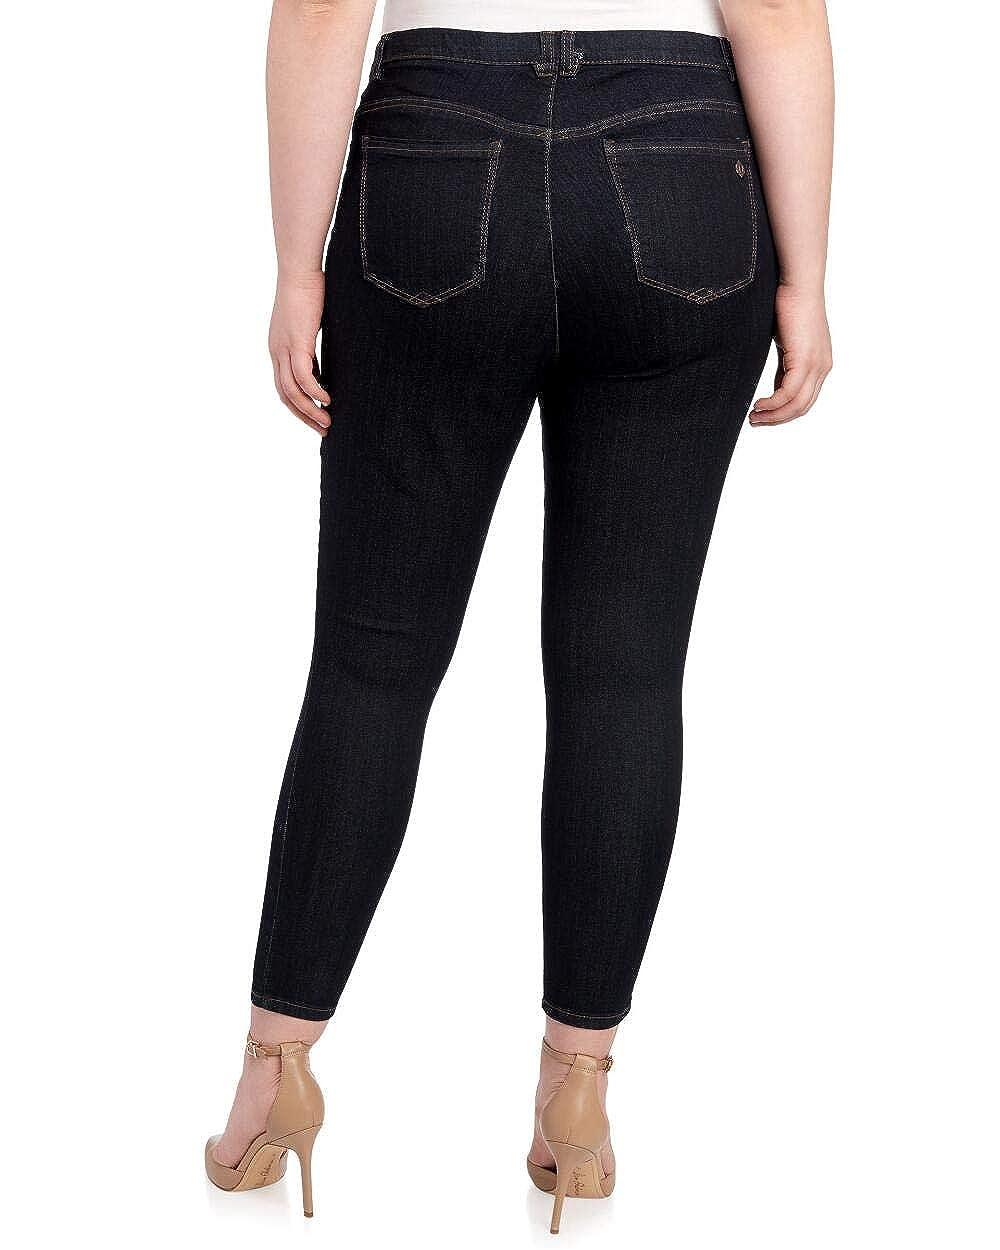 Indigo Democracy Ab Technology High Rise Plus Size Jeans